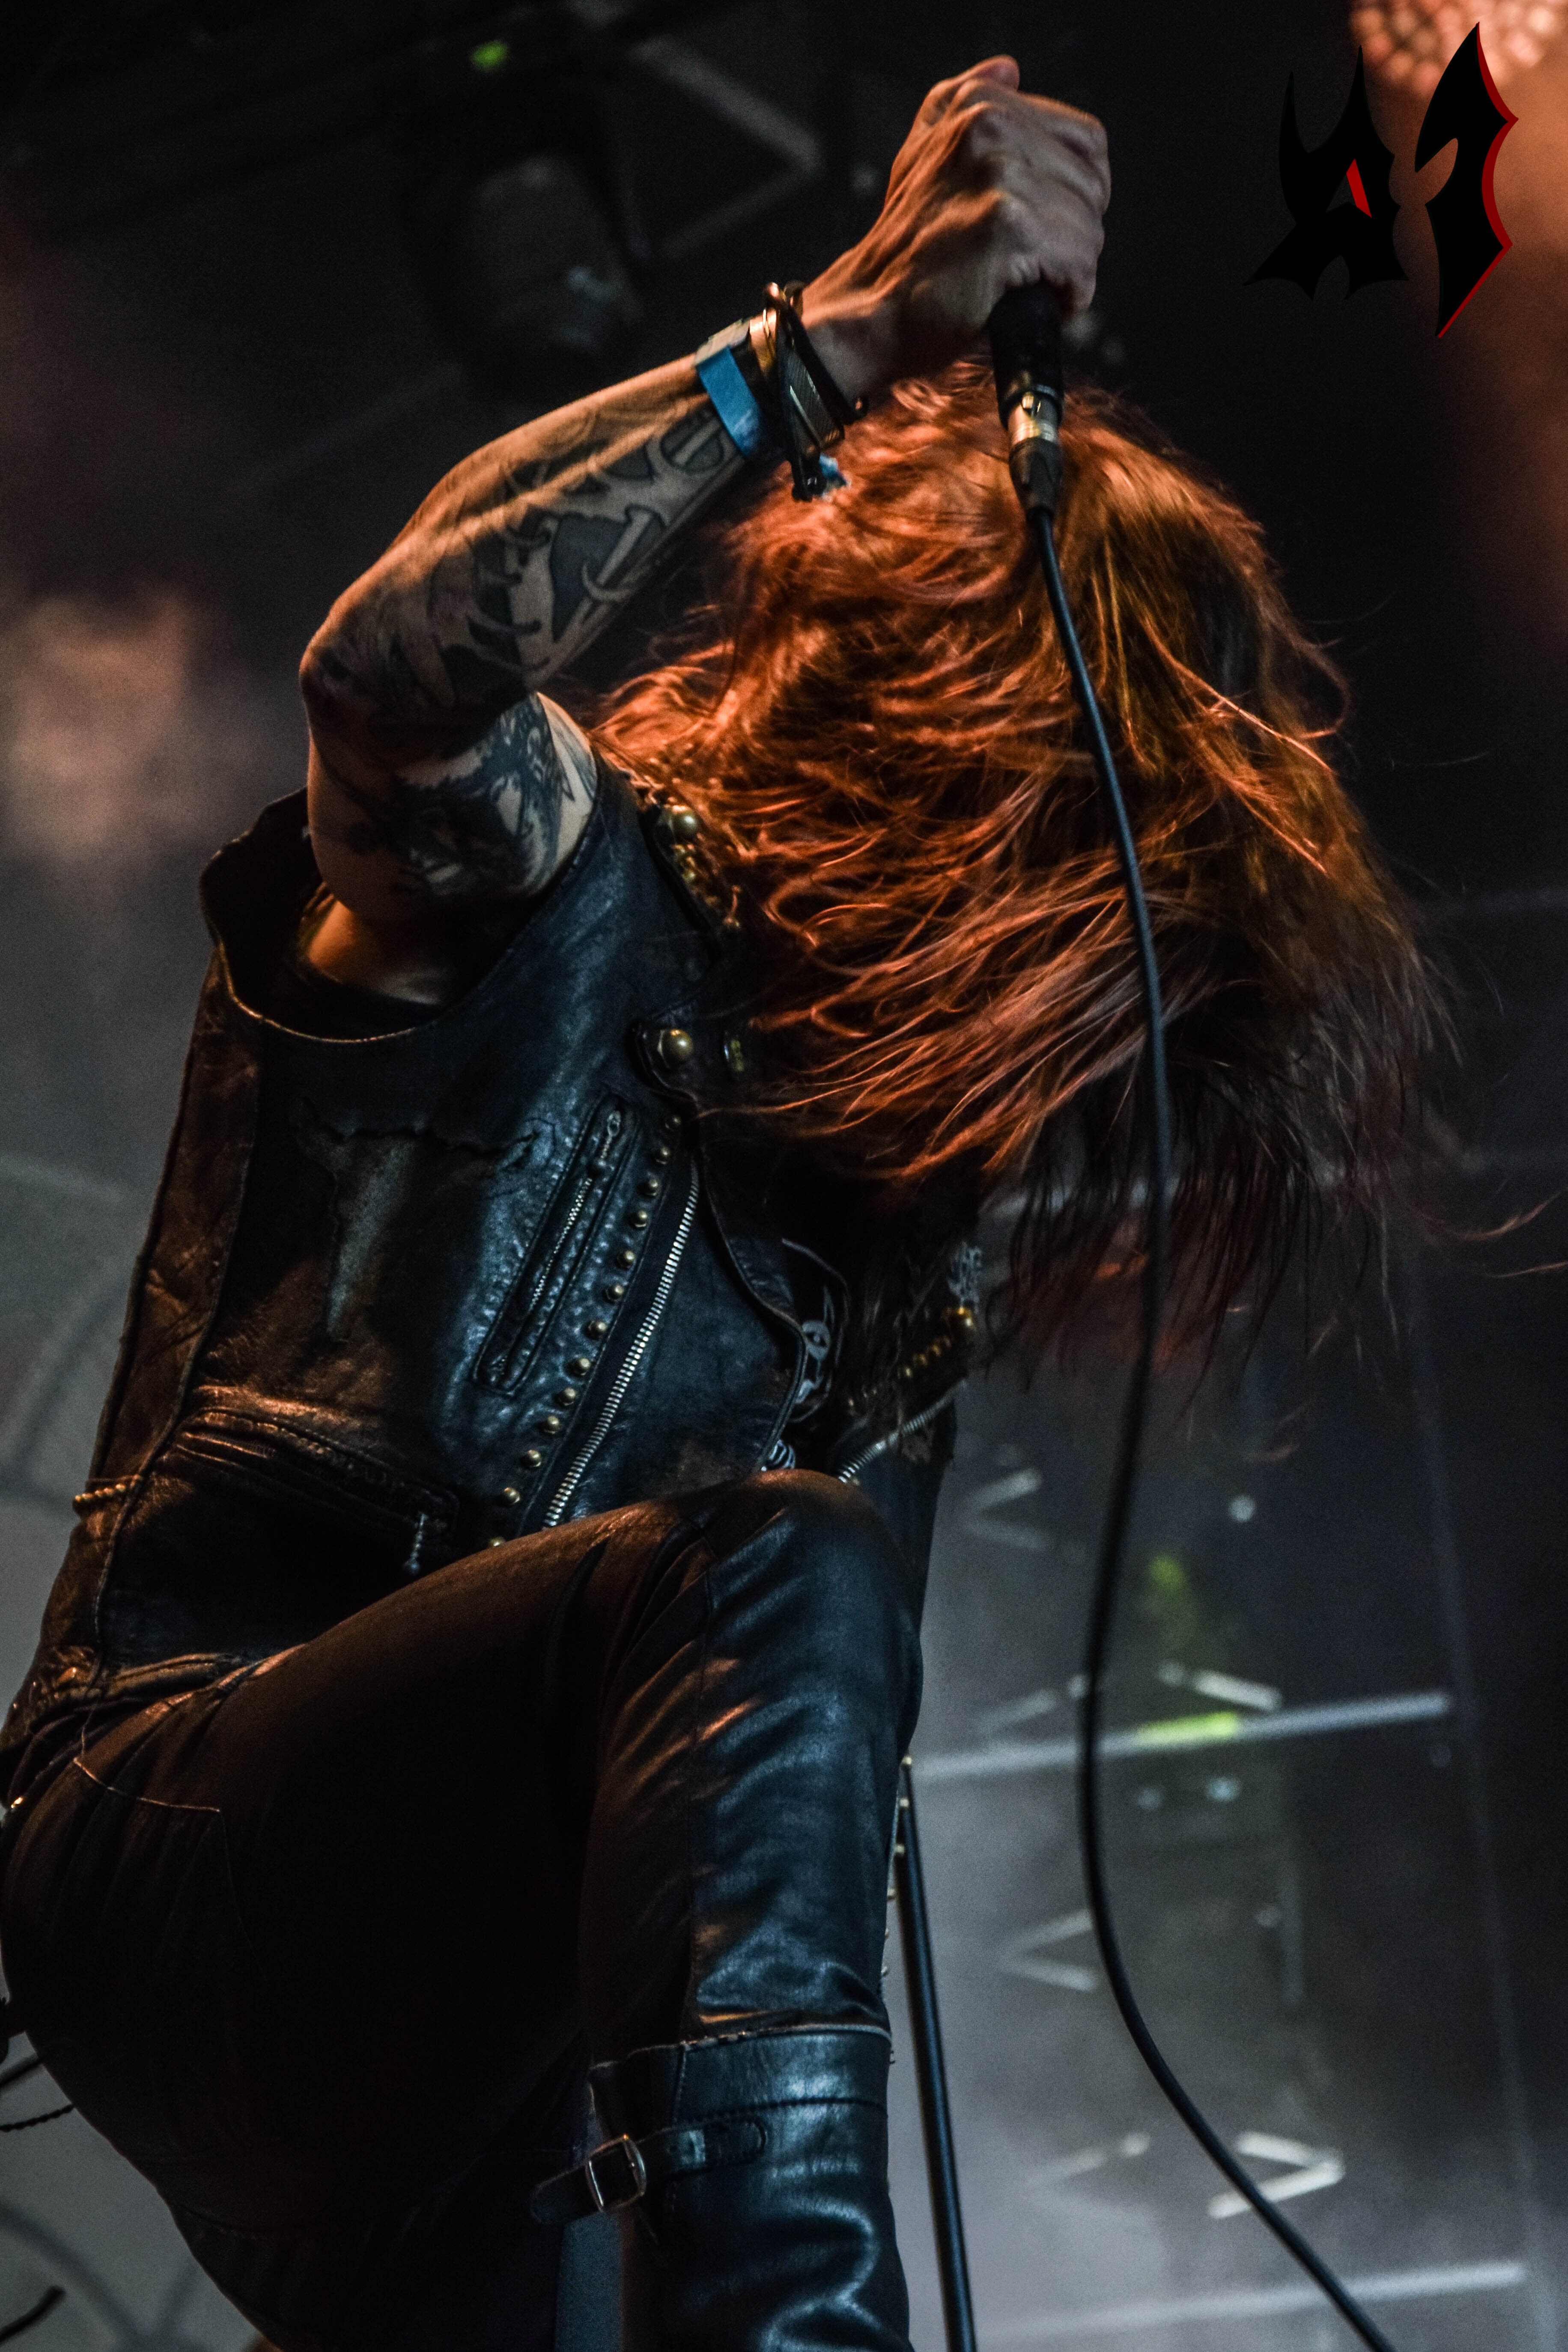 Hellfest 2018 – Day 3 - Amorphis 6